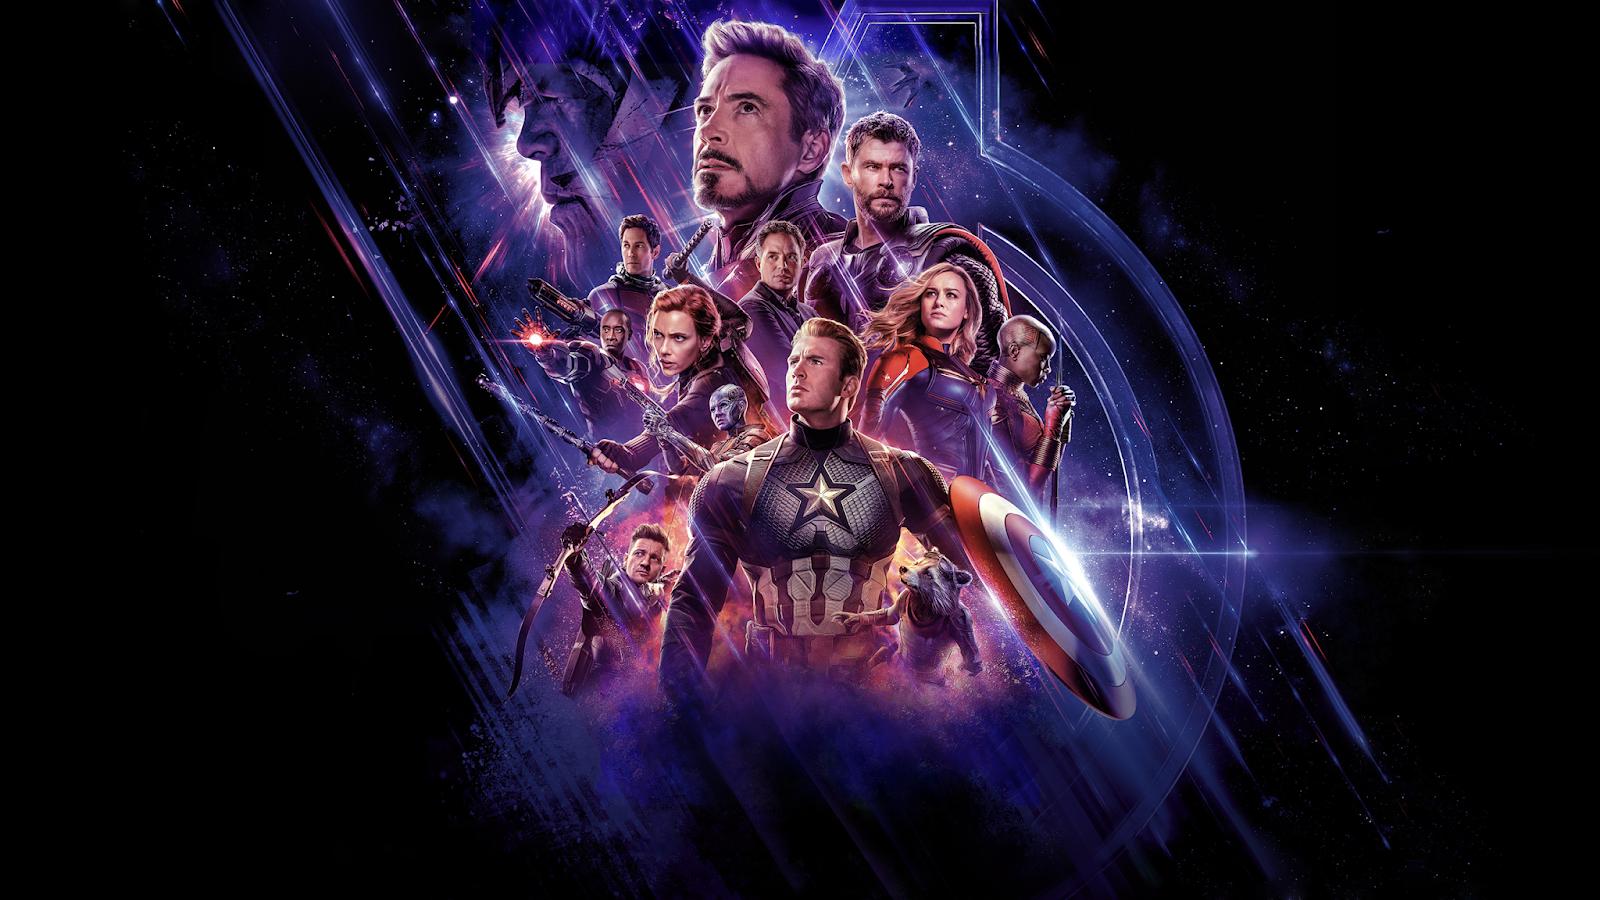 avengers endgame tamil dubbed movie free download isaimini.com